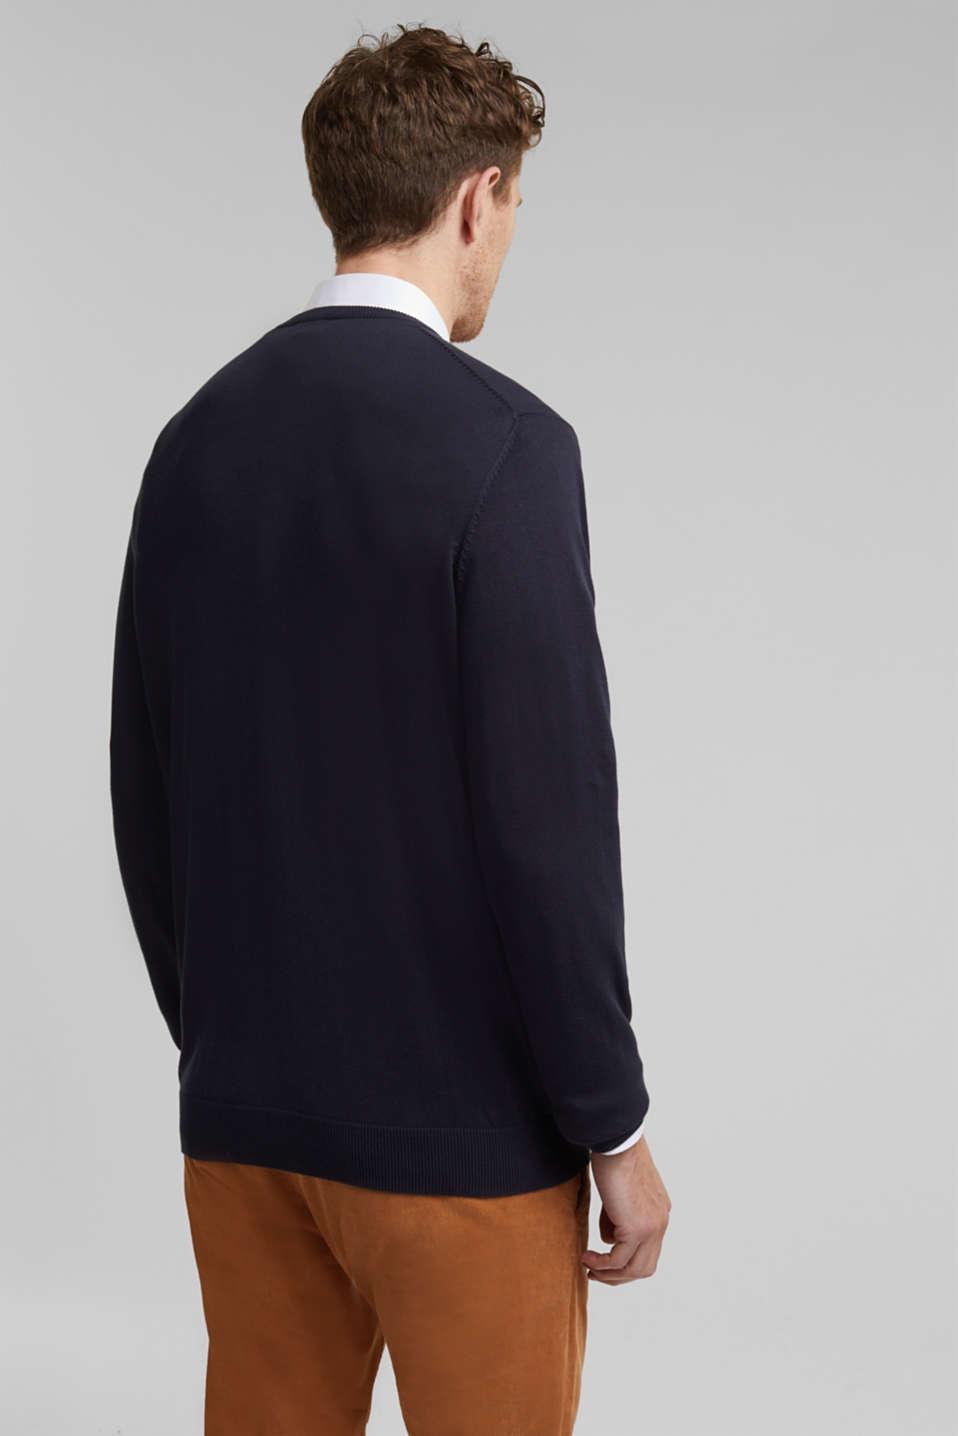 Jumper with a round neckline, 100% cotton, NAVY, detail image number 3